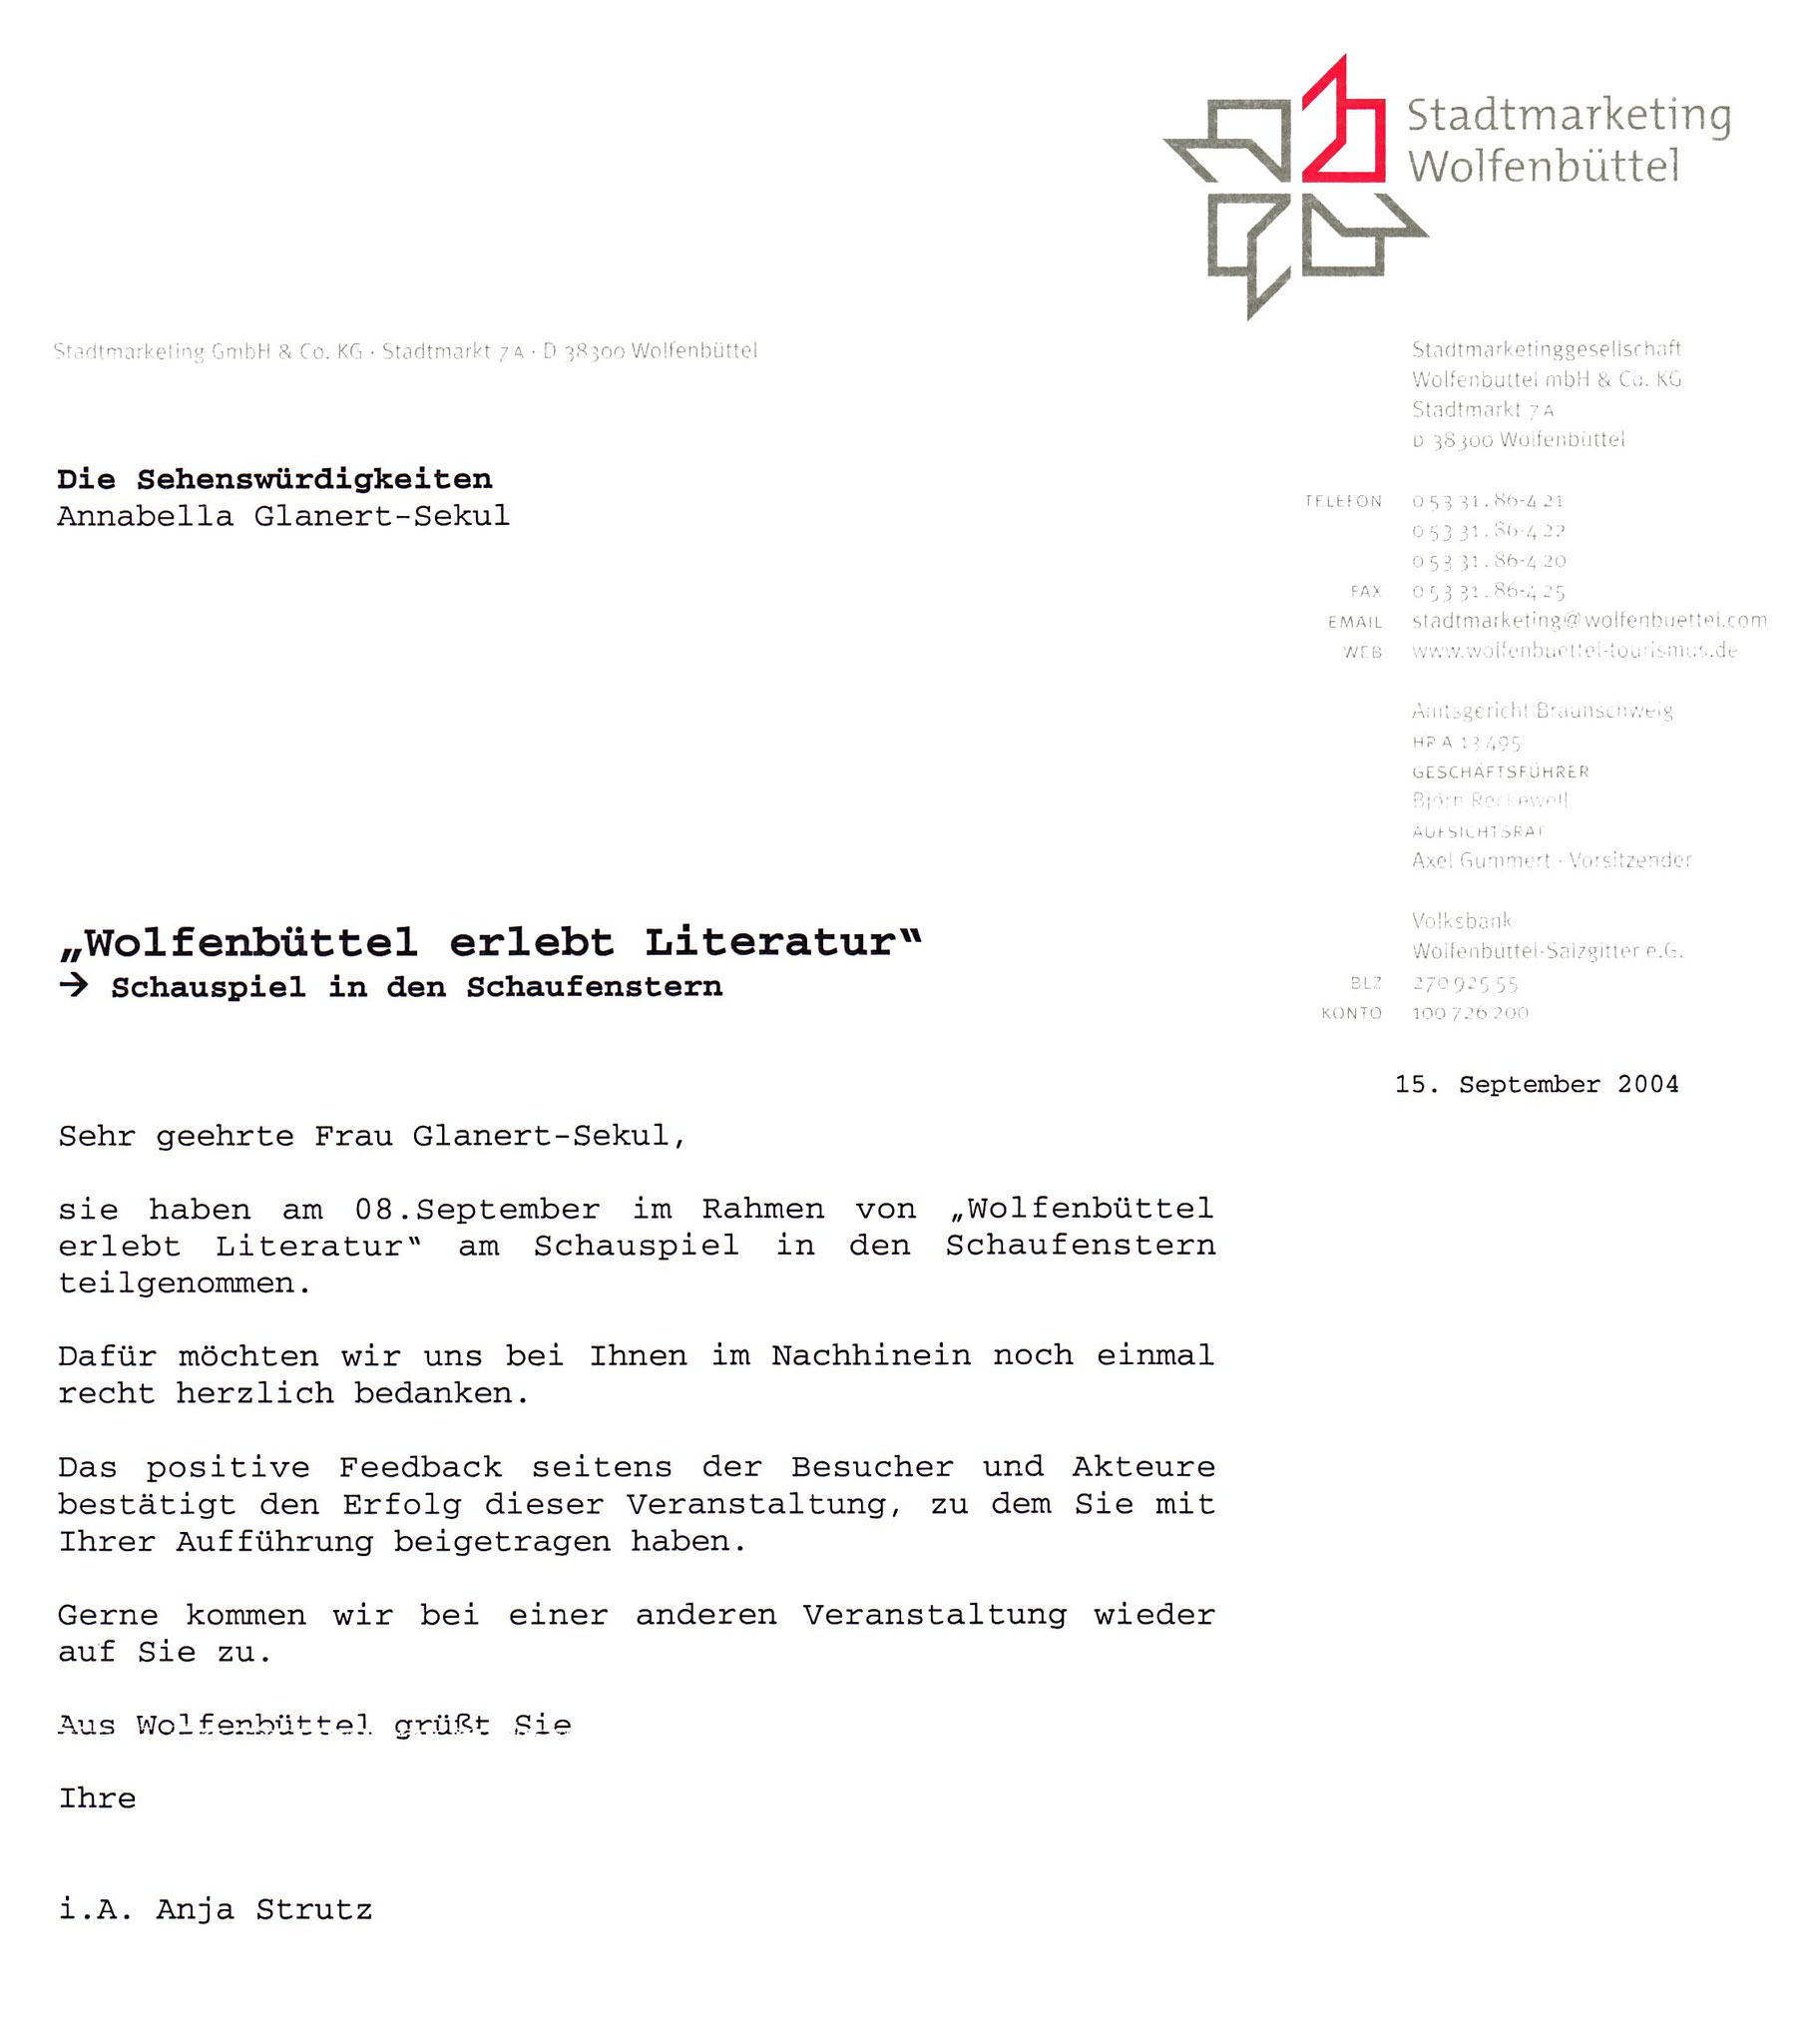 Stadtmarketing Wolfenbüttel